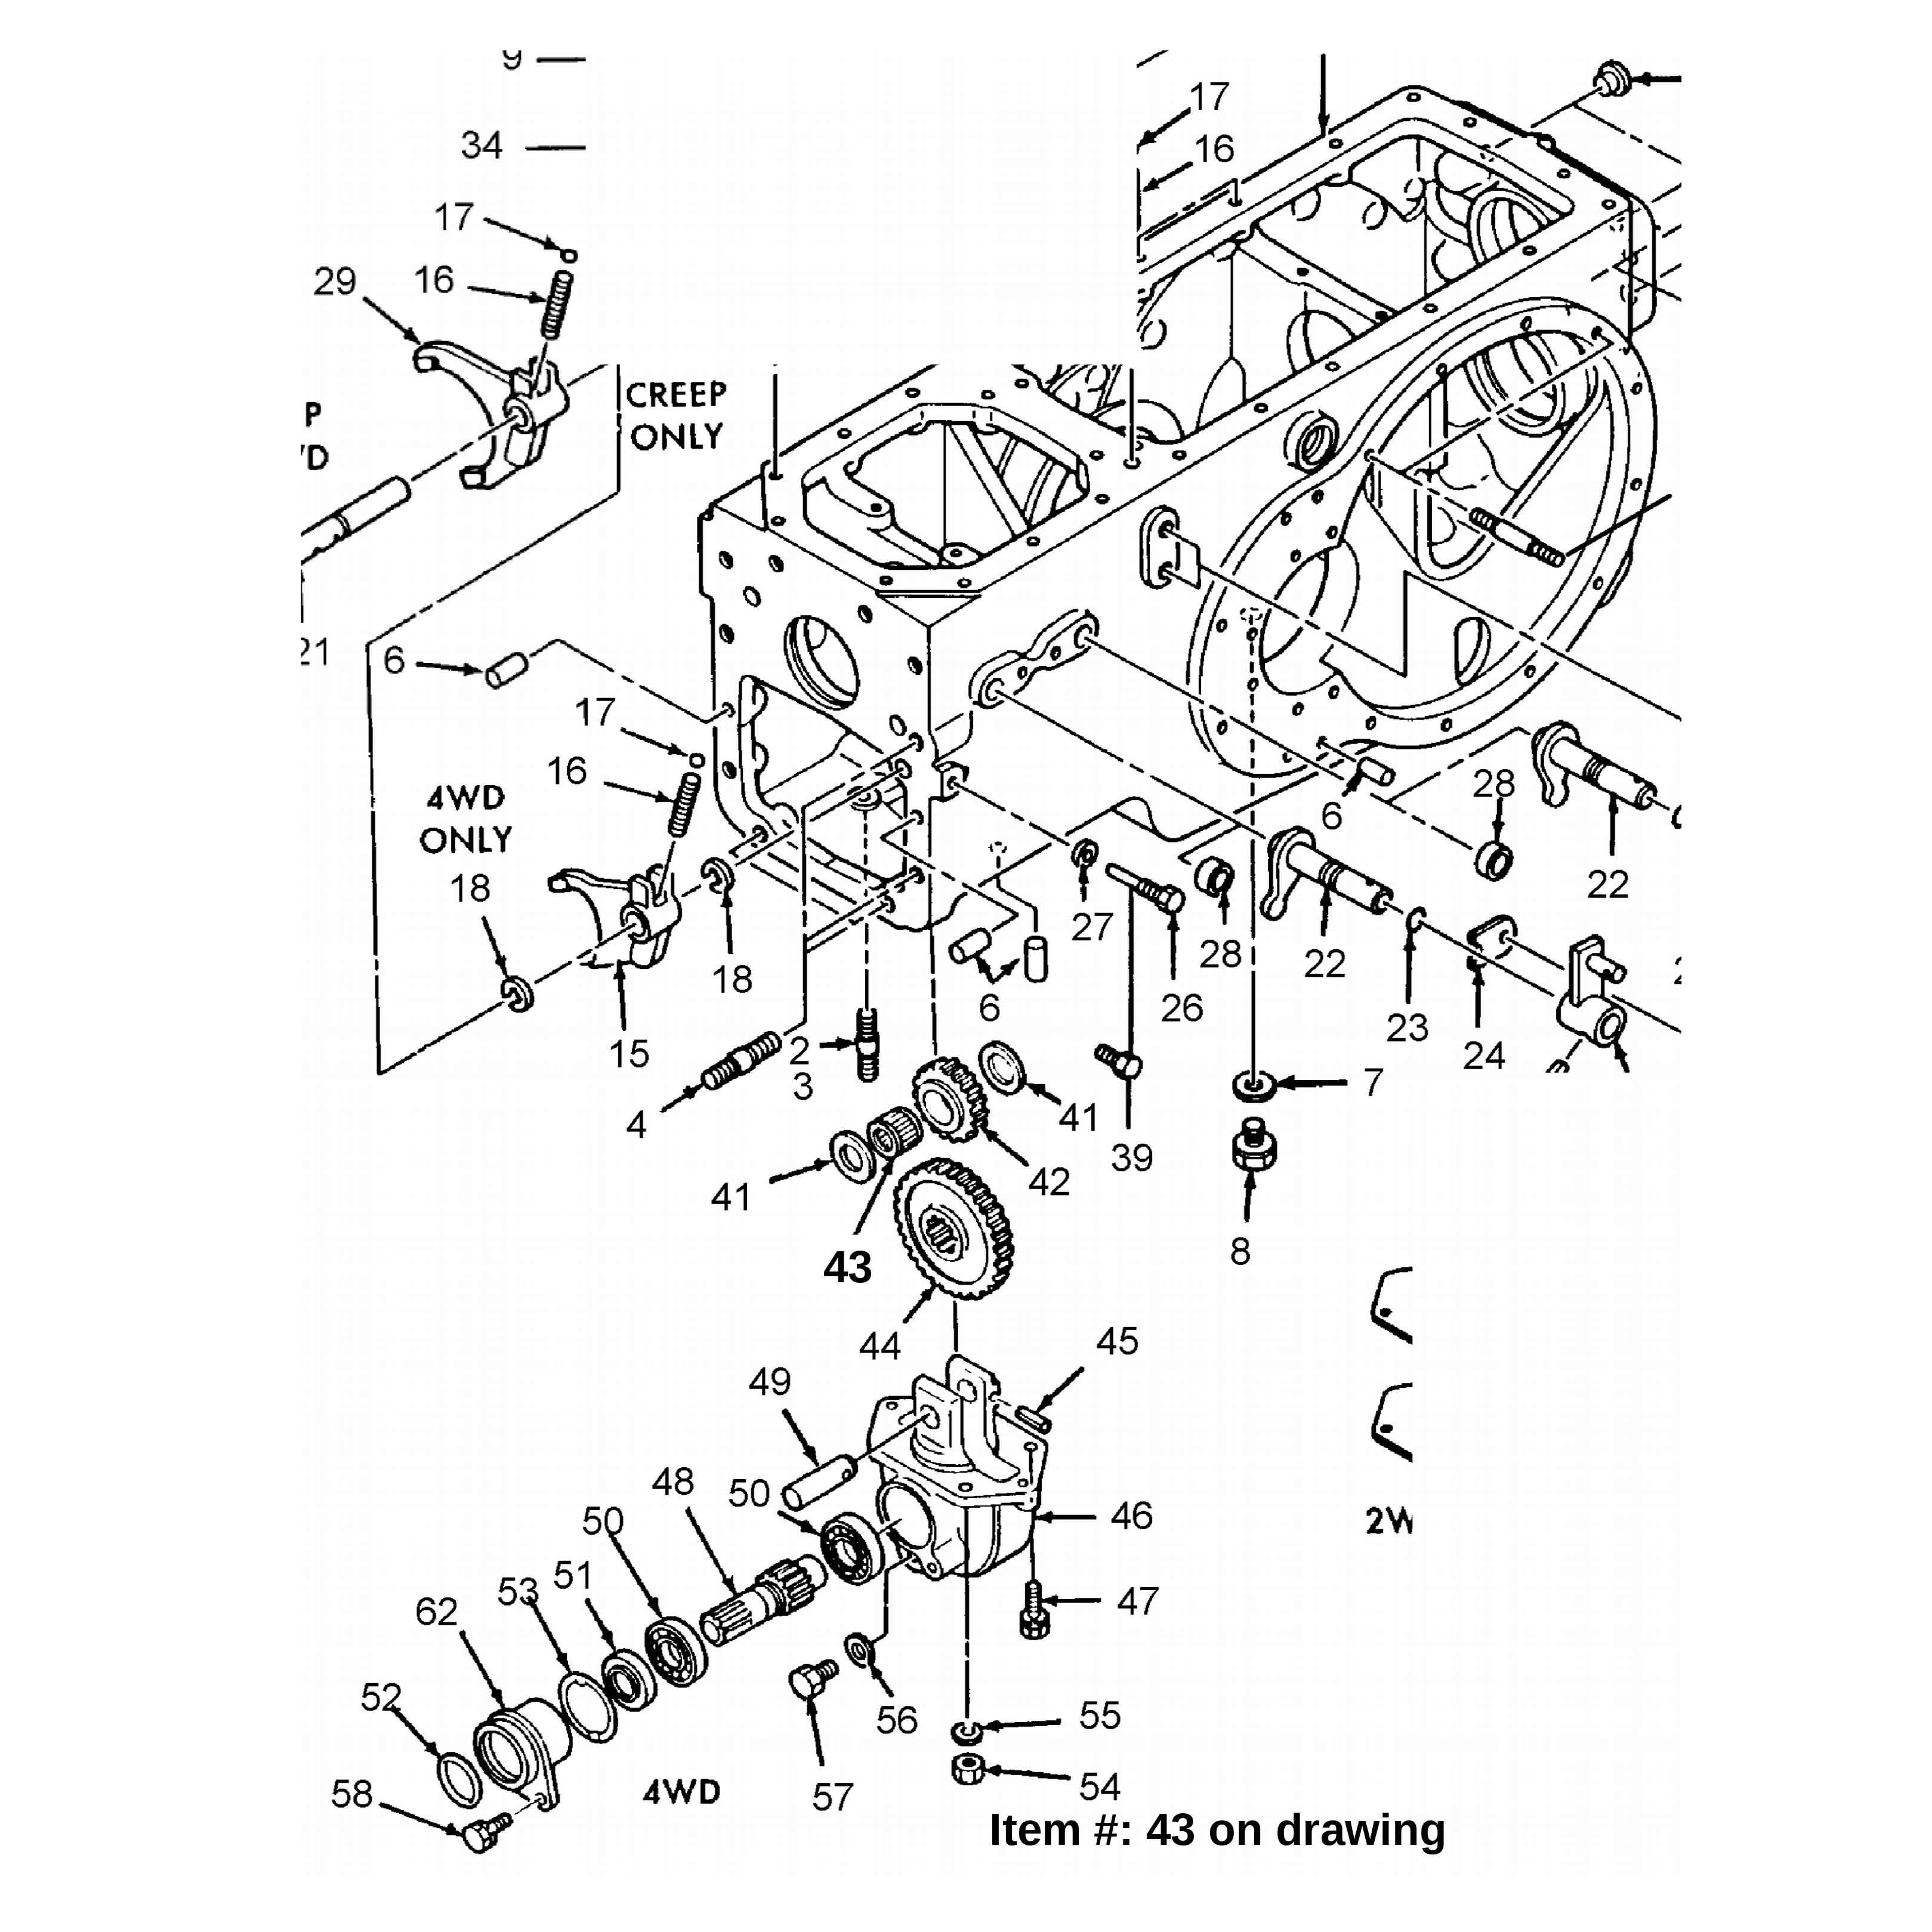 Ford 1710 Tractor Parts Diagram Seniorsclub It Cable Gossip Cable Gossip Pietrodavico It